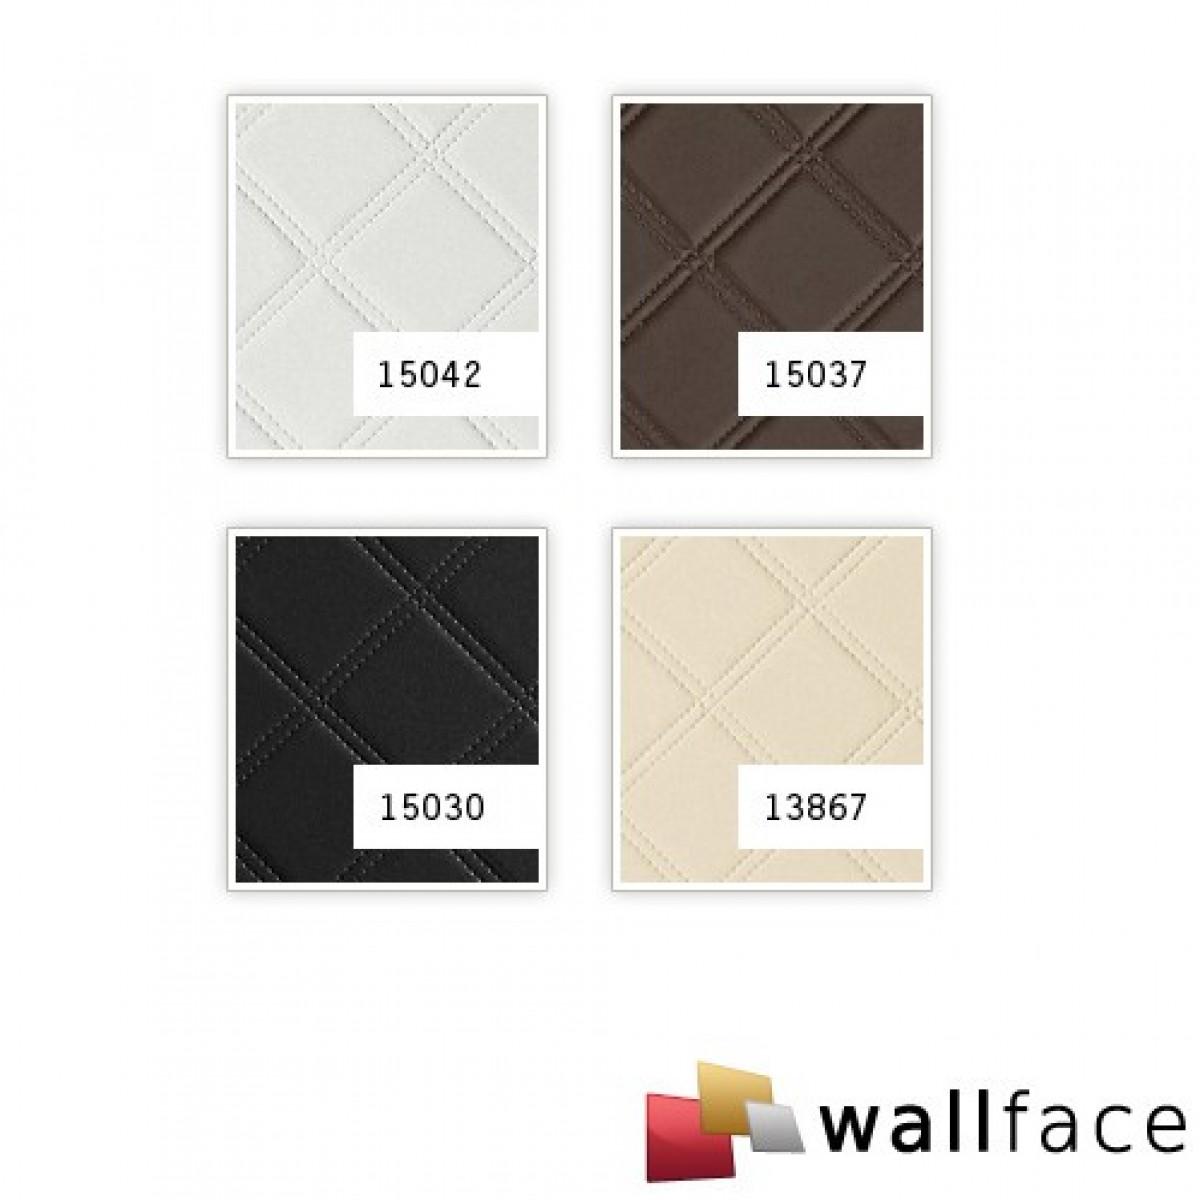 Panou decorativ LEATHER 15037, WallFace, autocolant